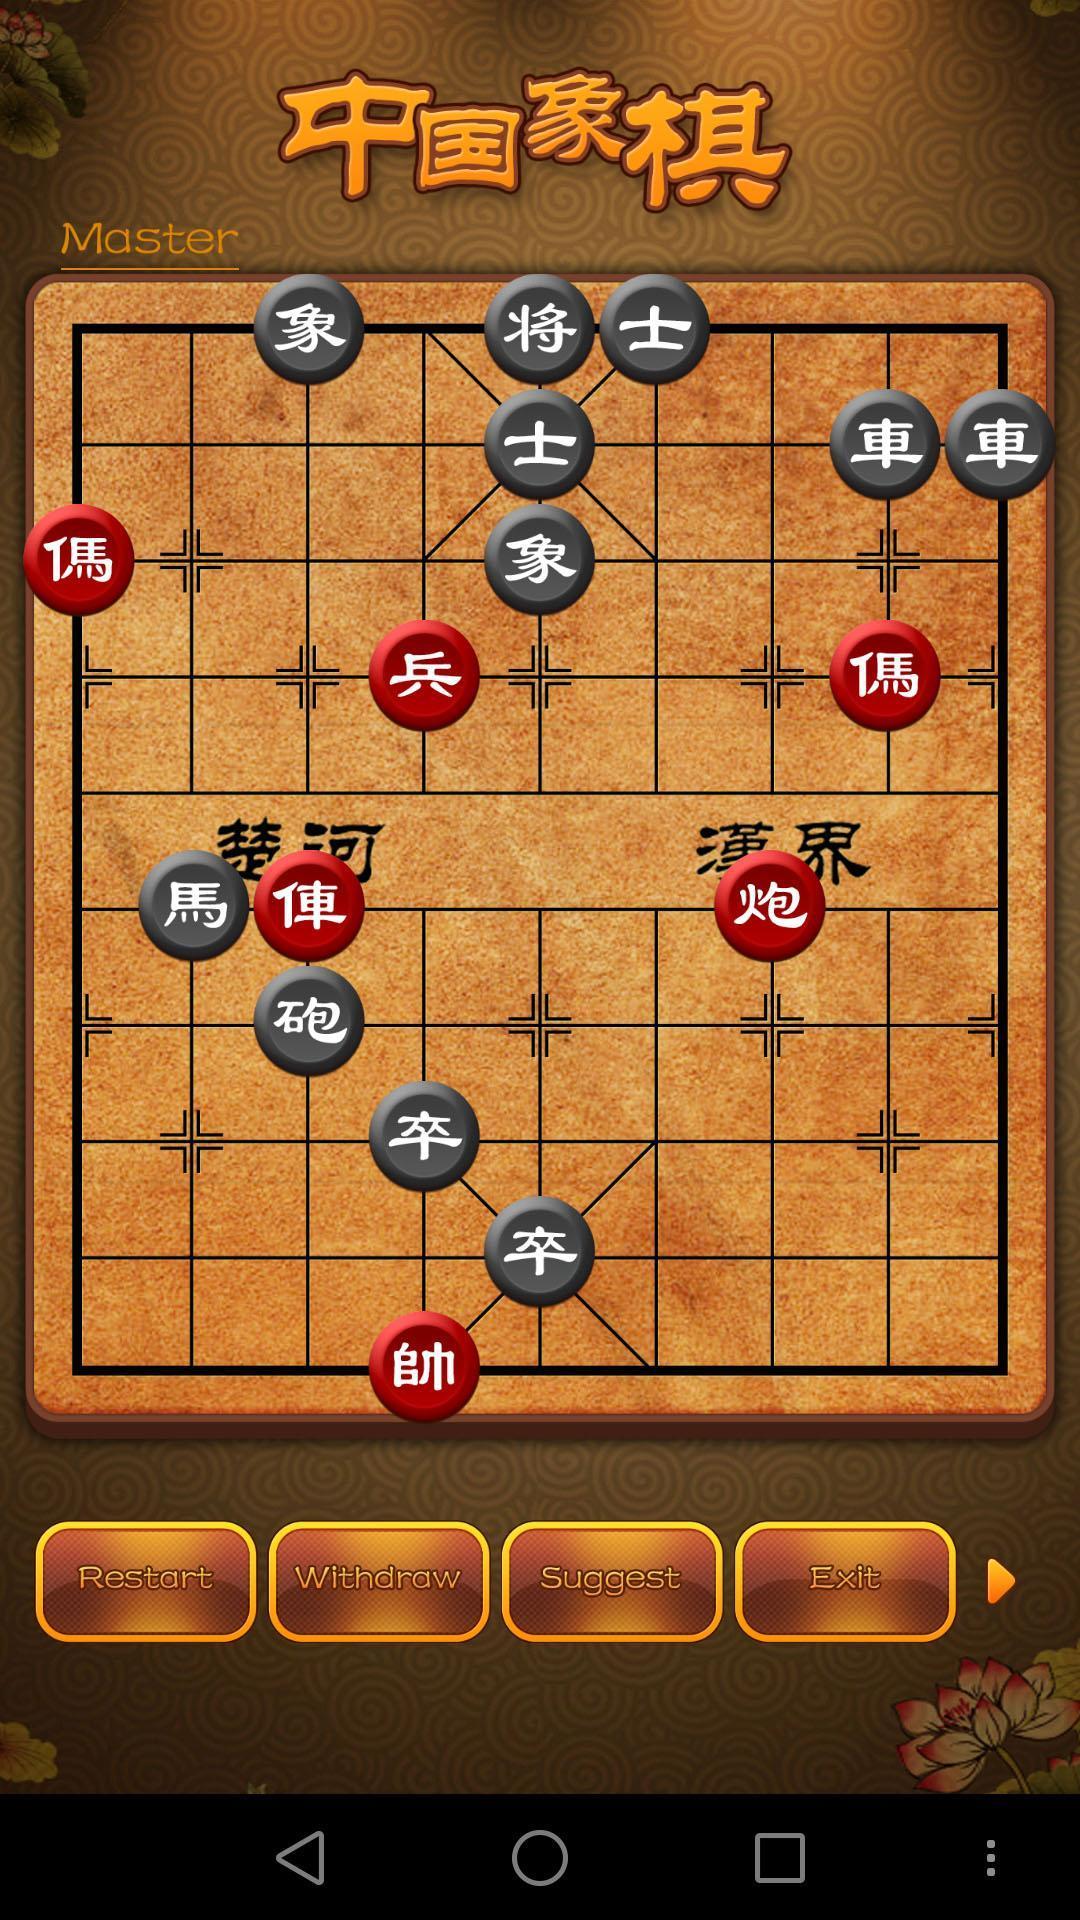 Chinese Chess, Xiangqi - many endgame and replay 3.9.6 Screenshot 2